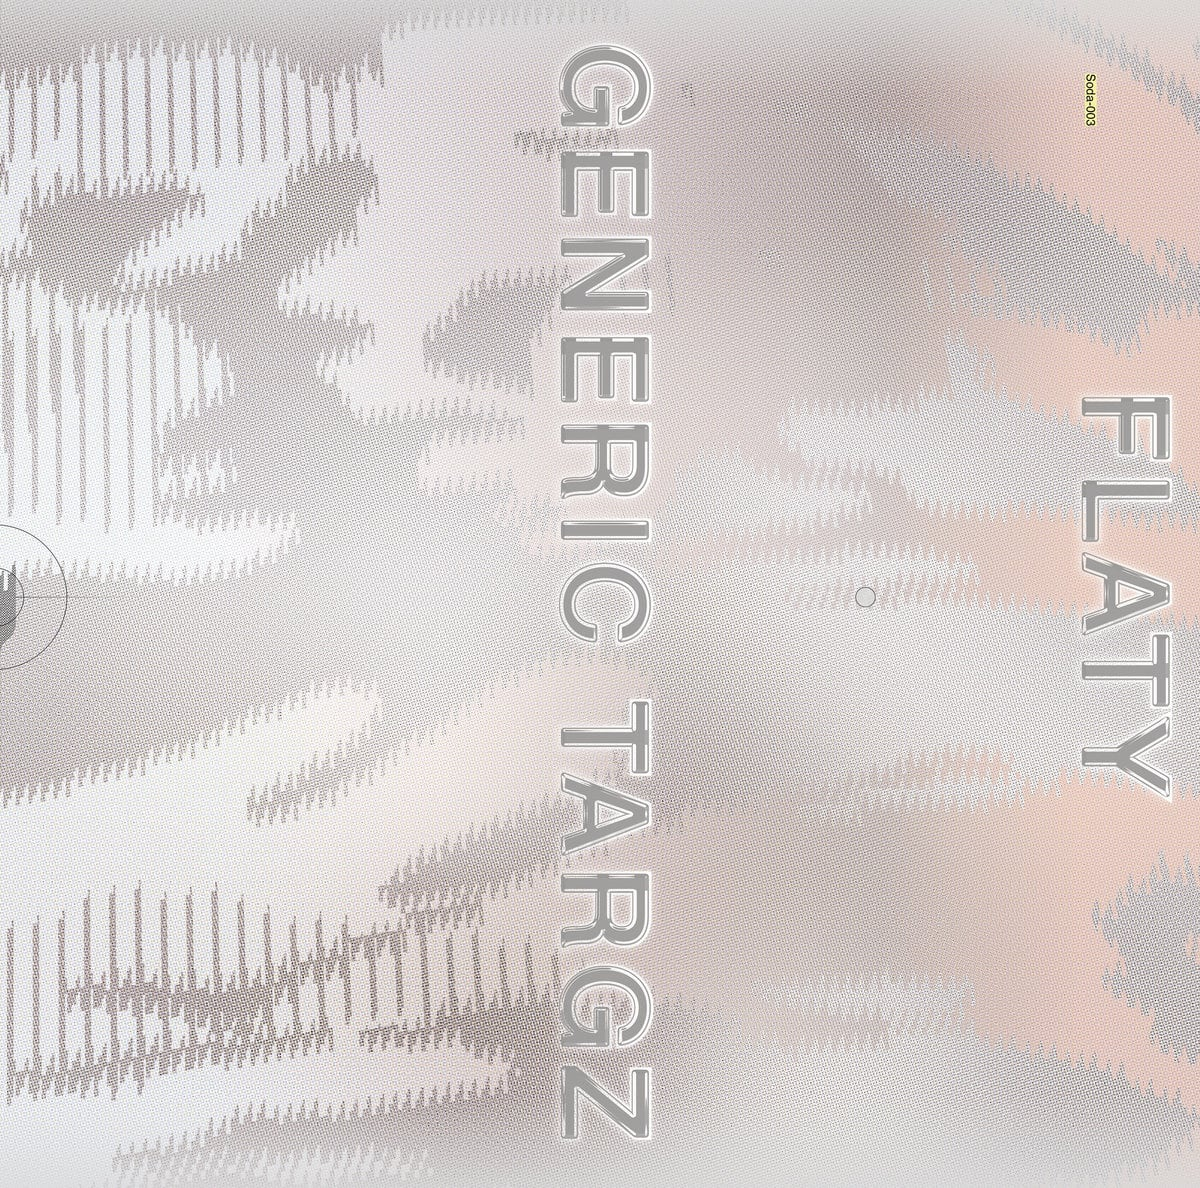 Flaty - Generic TARGZ (LP)